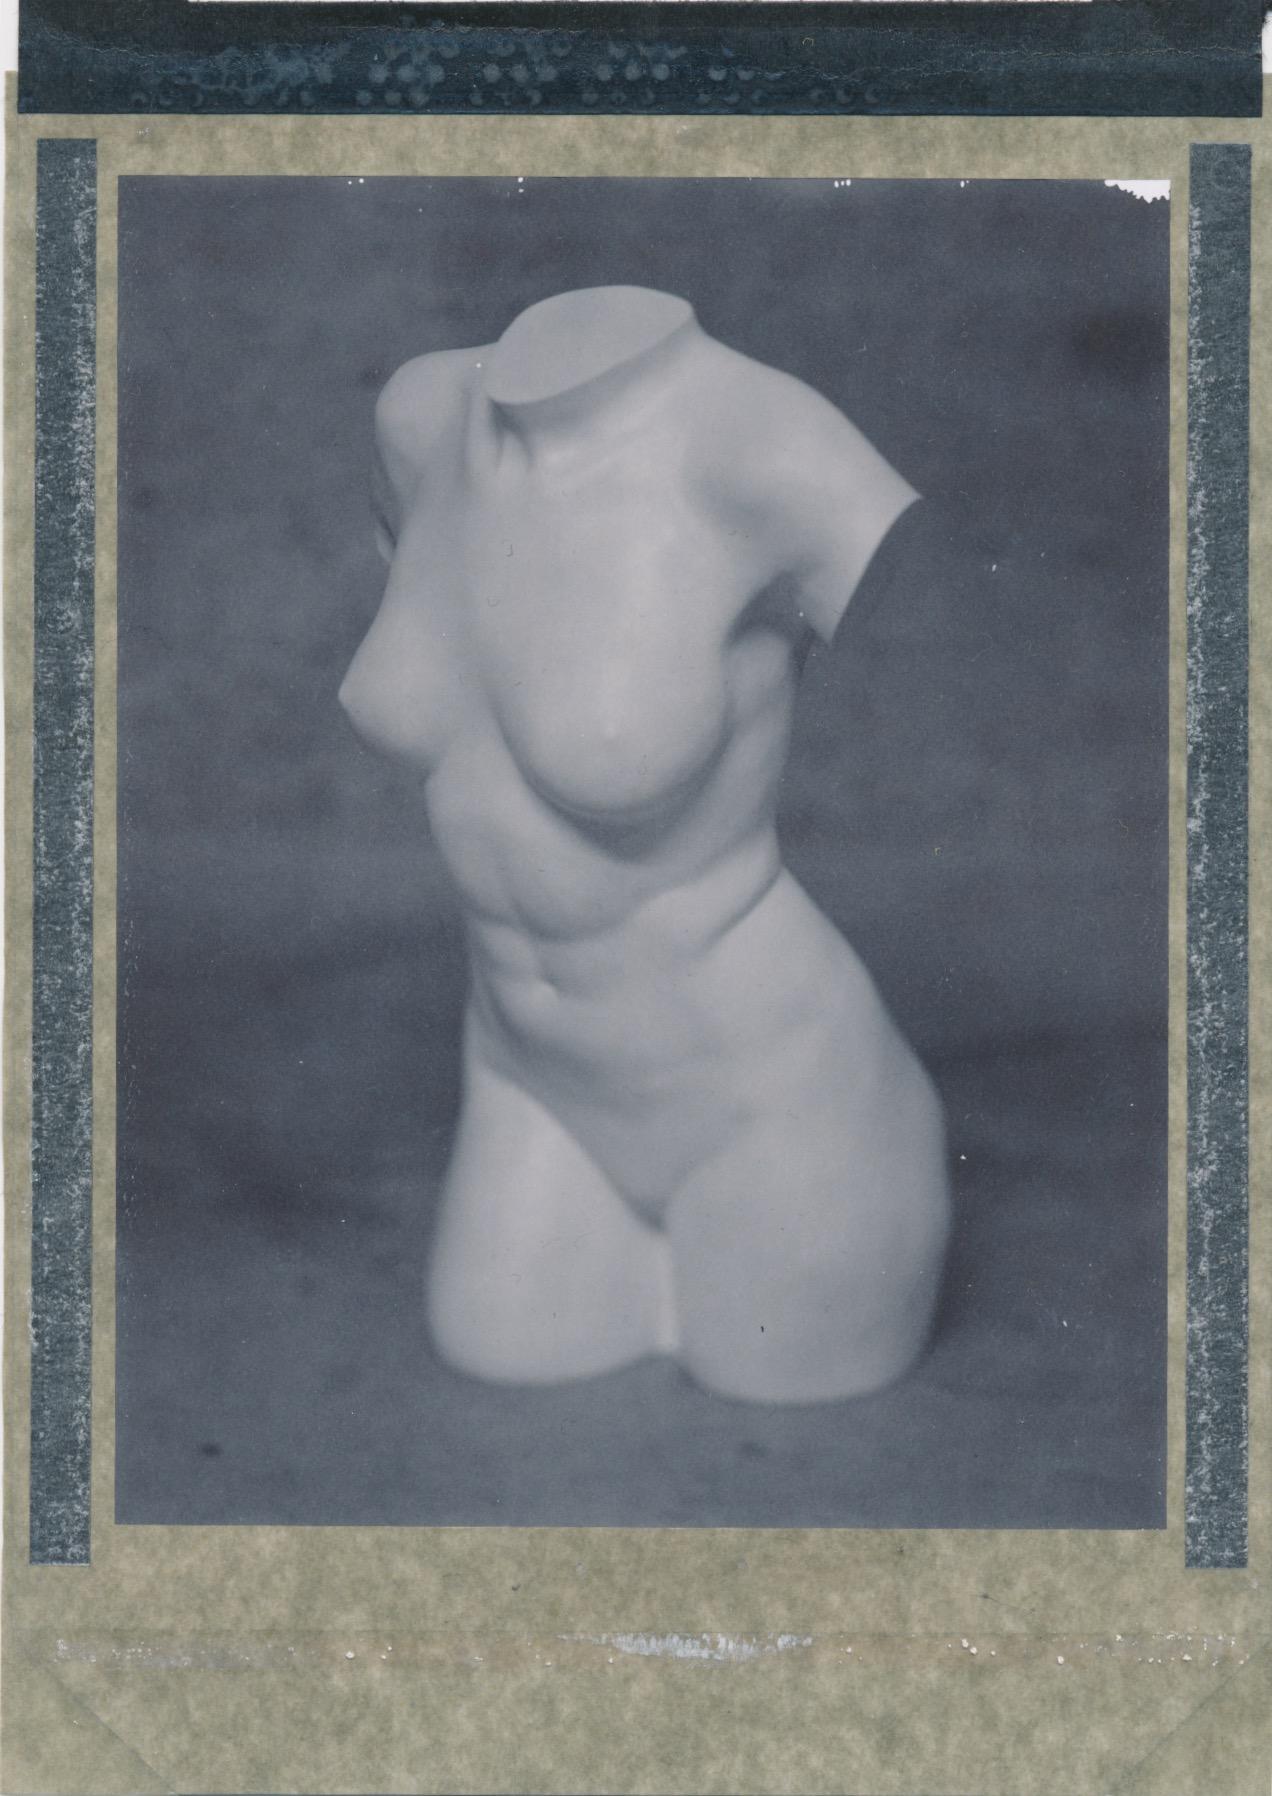 Untitled   2015  Polaroid 4x5